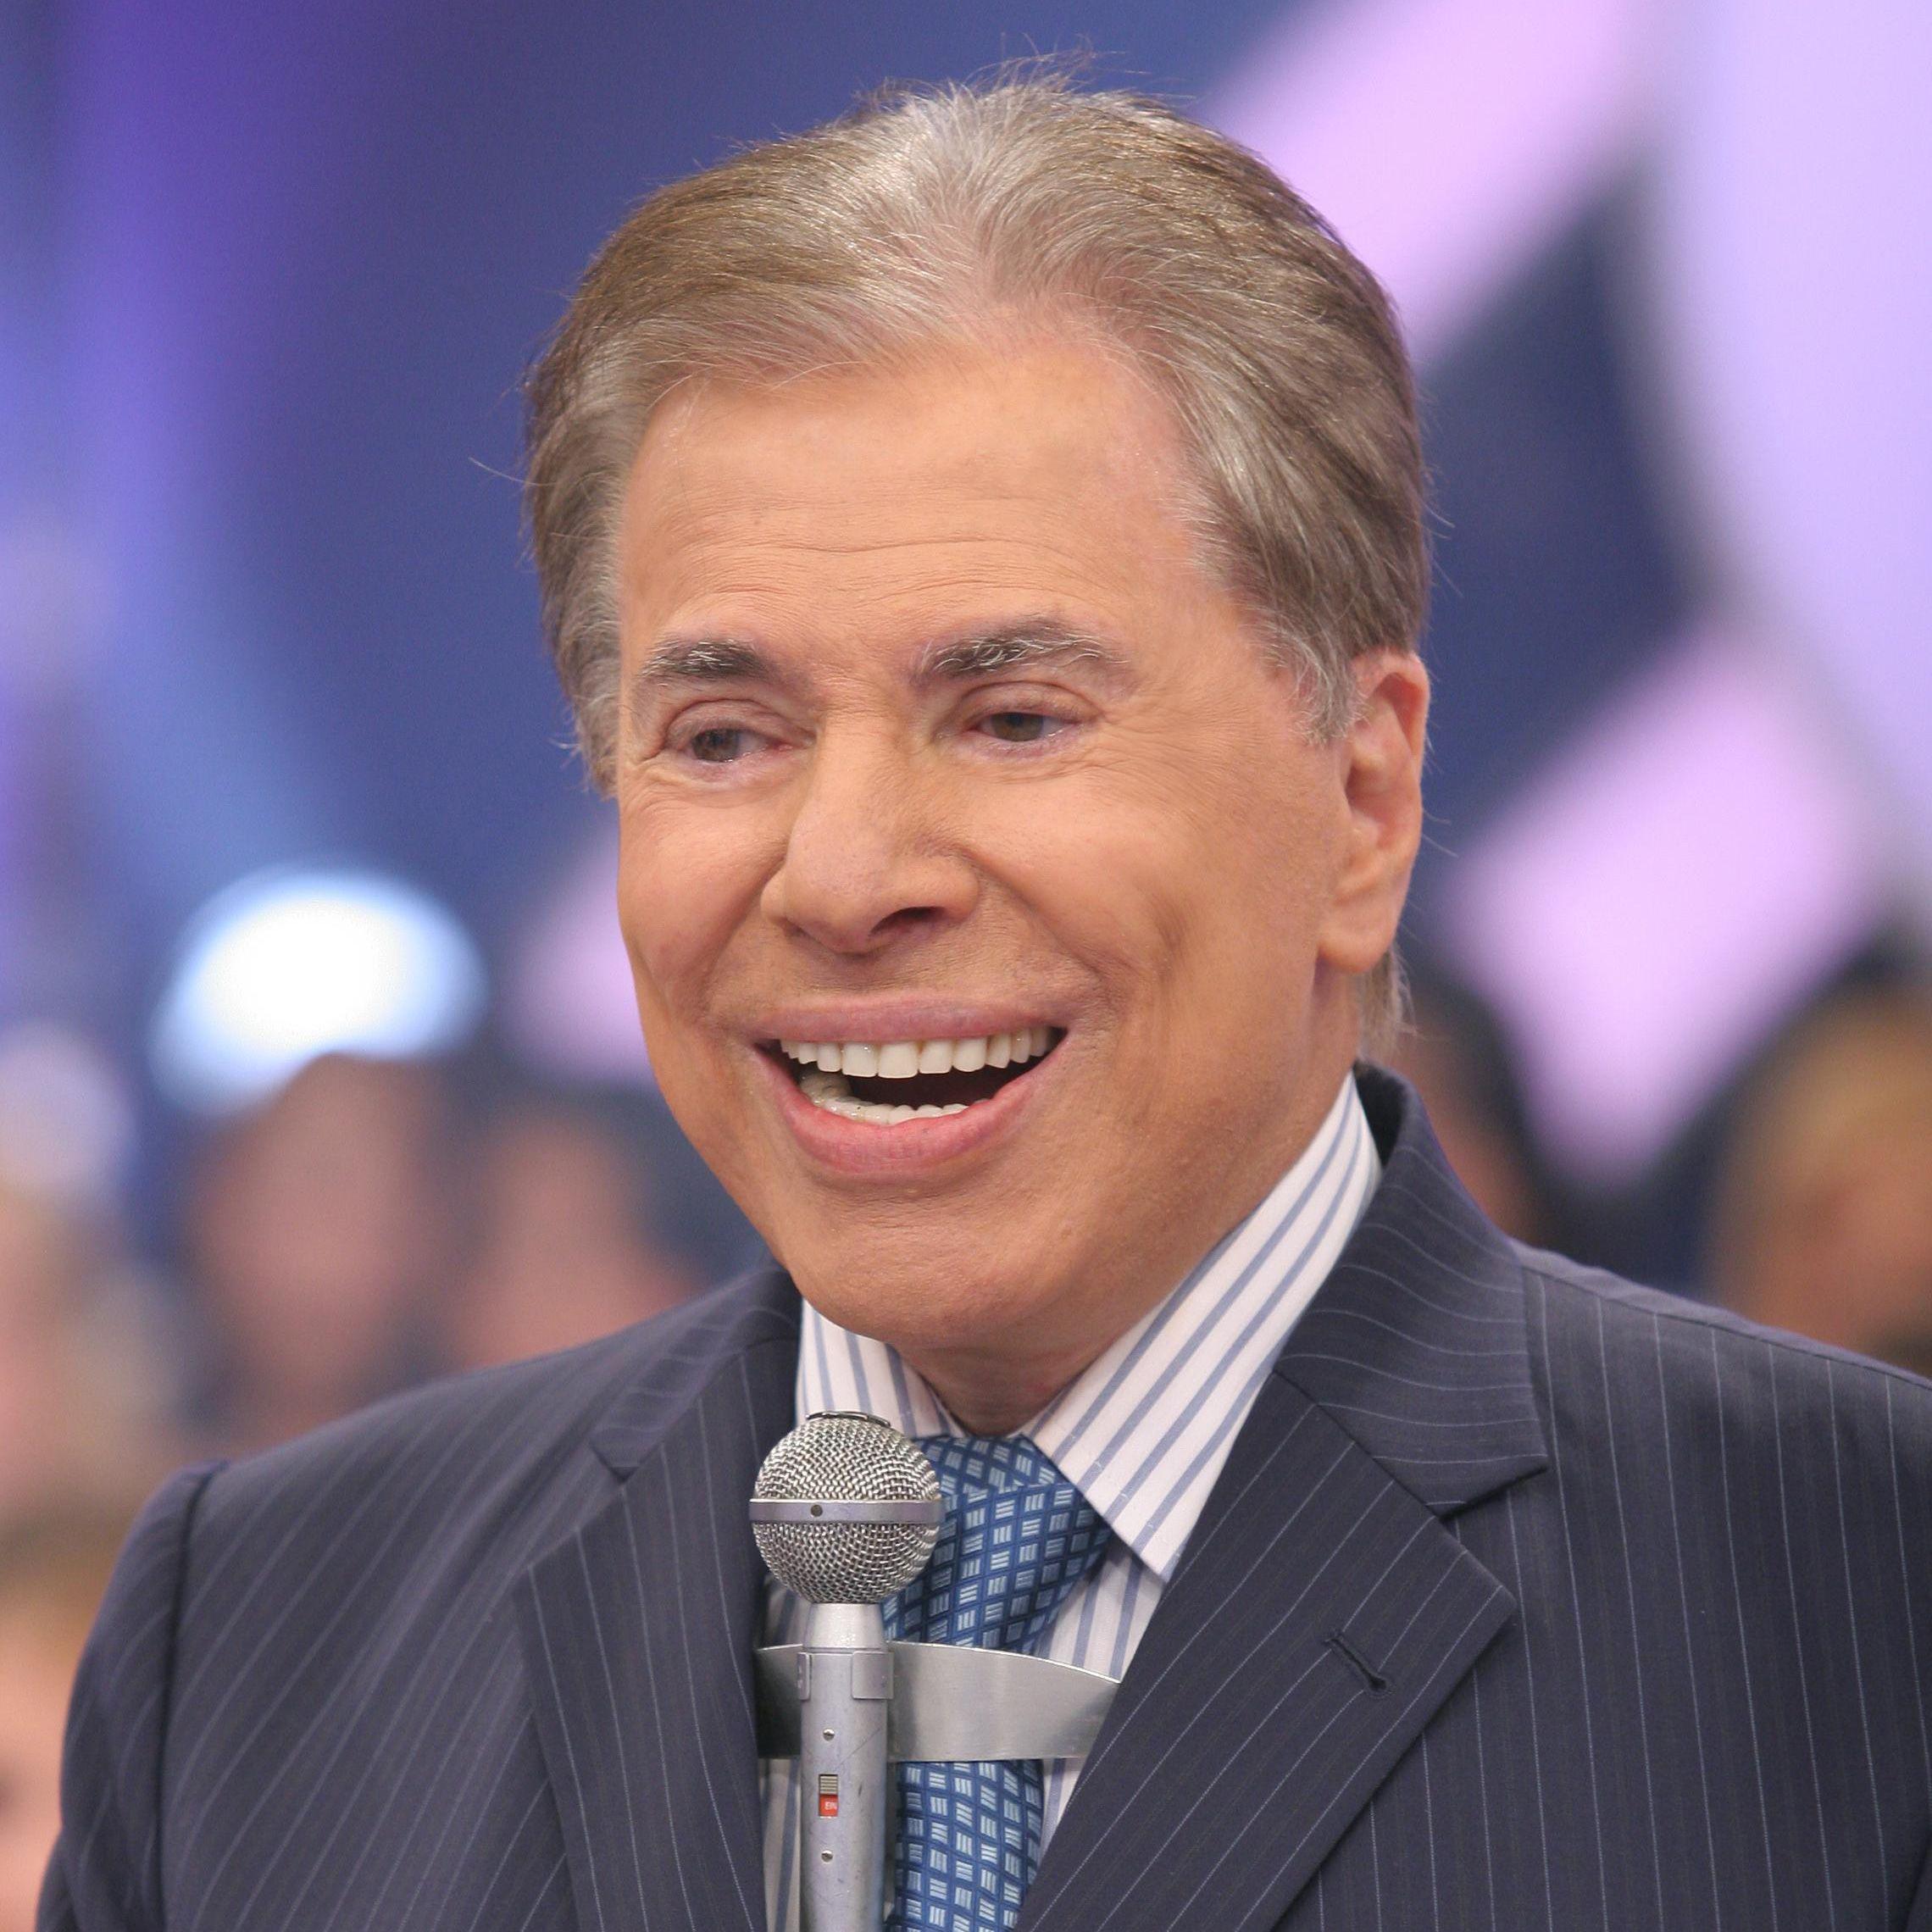 Silvio Santos Net Worth